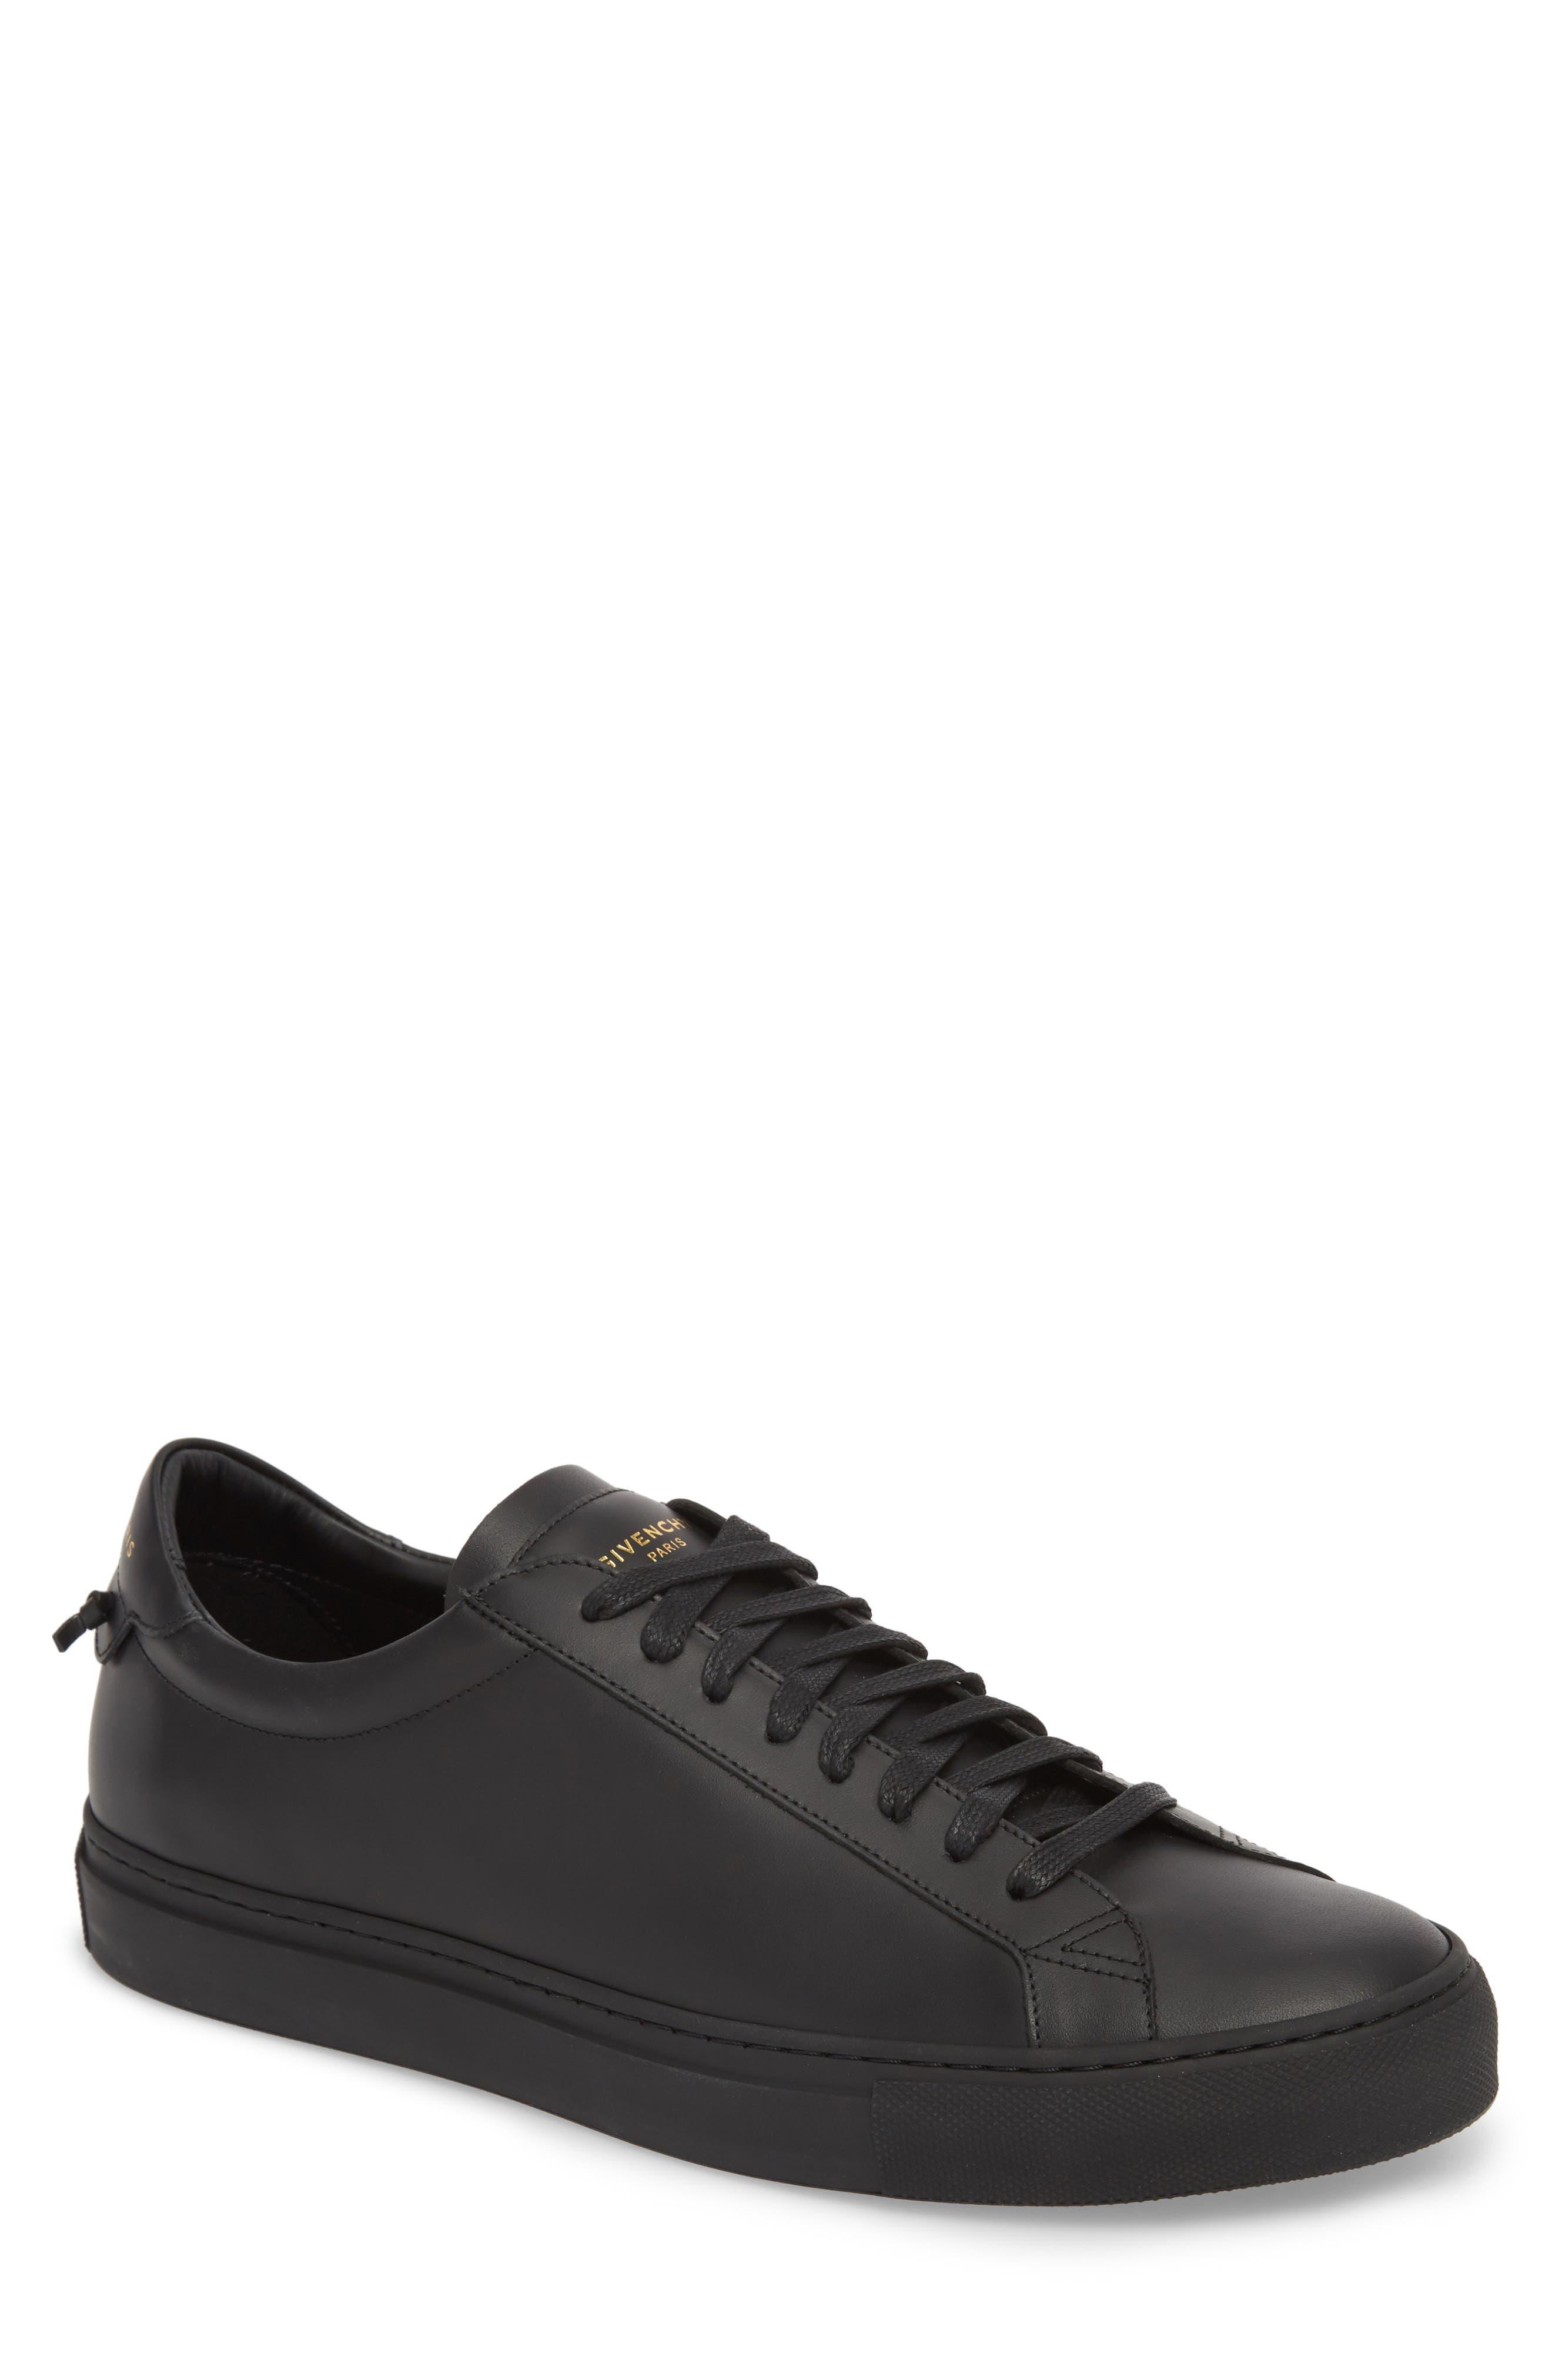 'Urban Knots Lo' Sneaker,                             Main thumbnail 1, color,                             Black